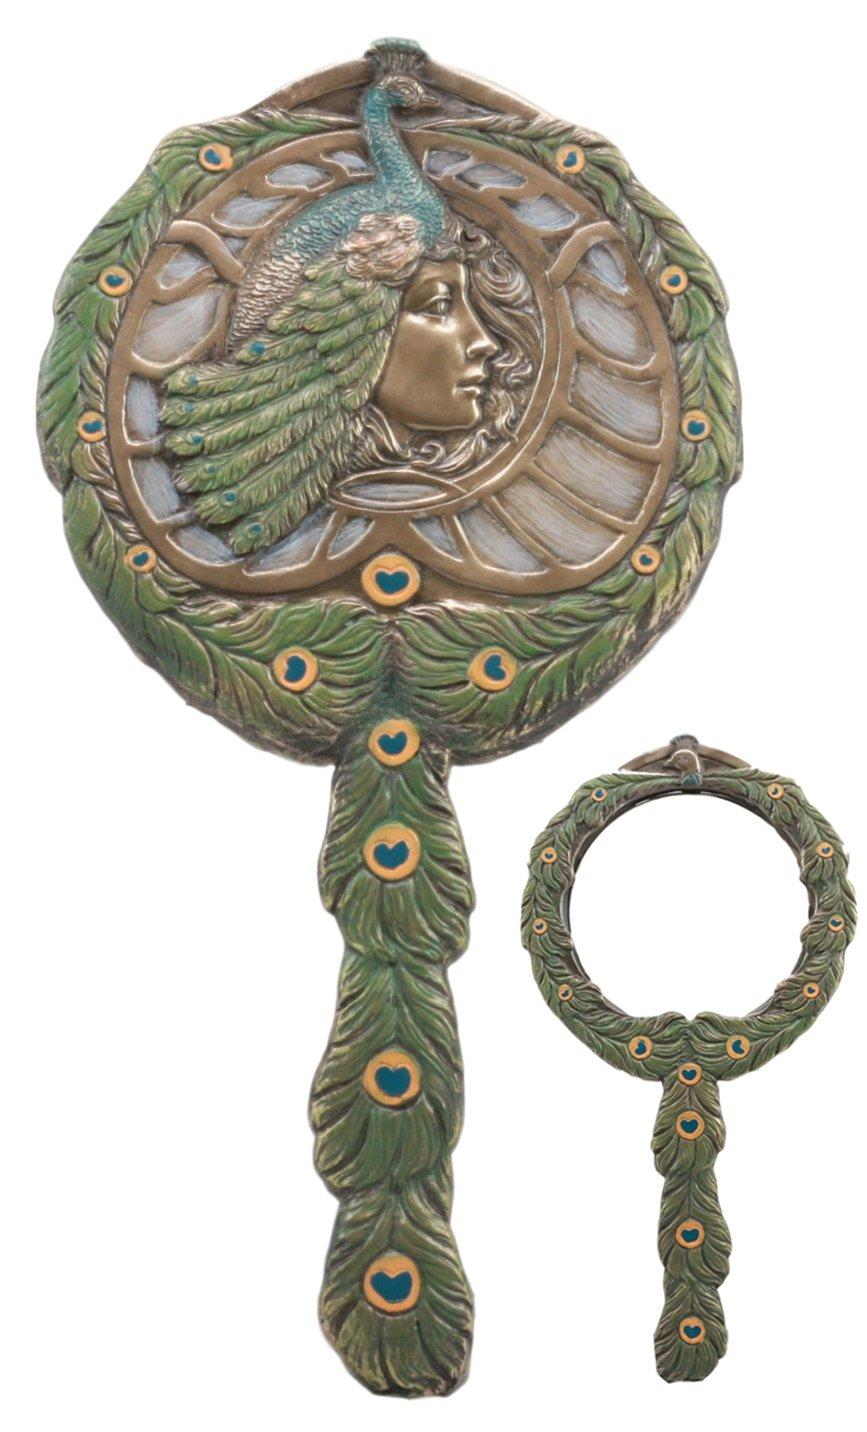 Ebros Faux Bronze Beautiful Egyptian Queen Cleopatra With Peacock Headdress Hand Mirror 11.25''Tall Art Nouveau Figurine Vanity Decor